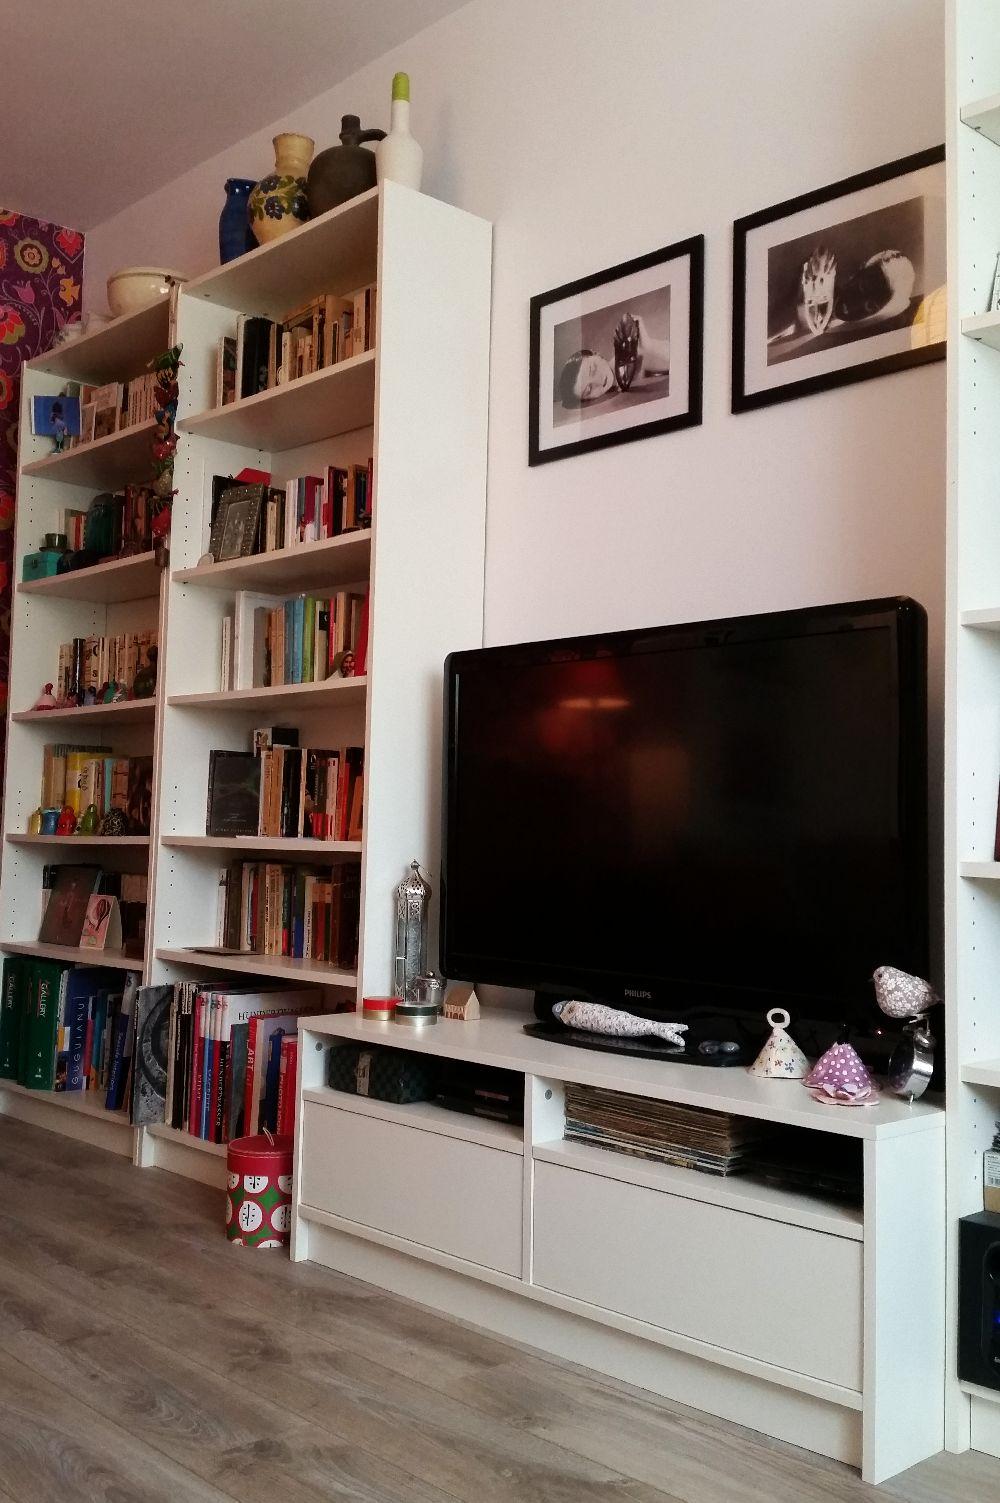 adelaparvu.com despre apartament 3 camere colorat in Sibiu, Foto Adela Parvu (54)